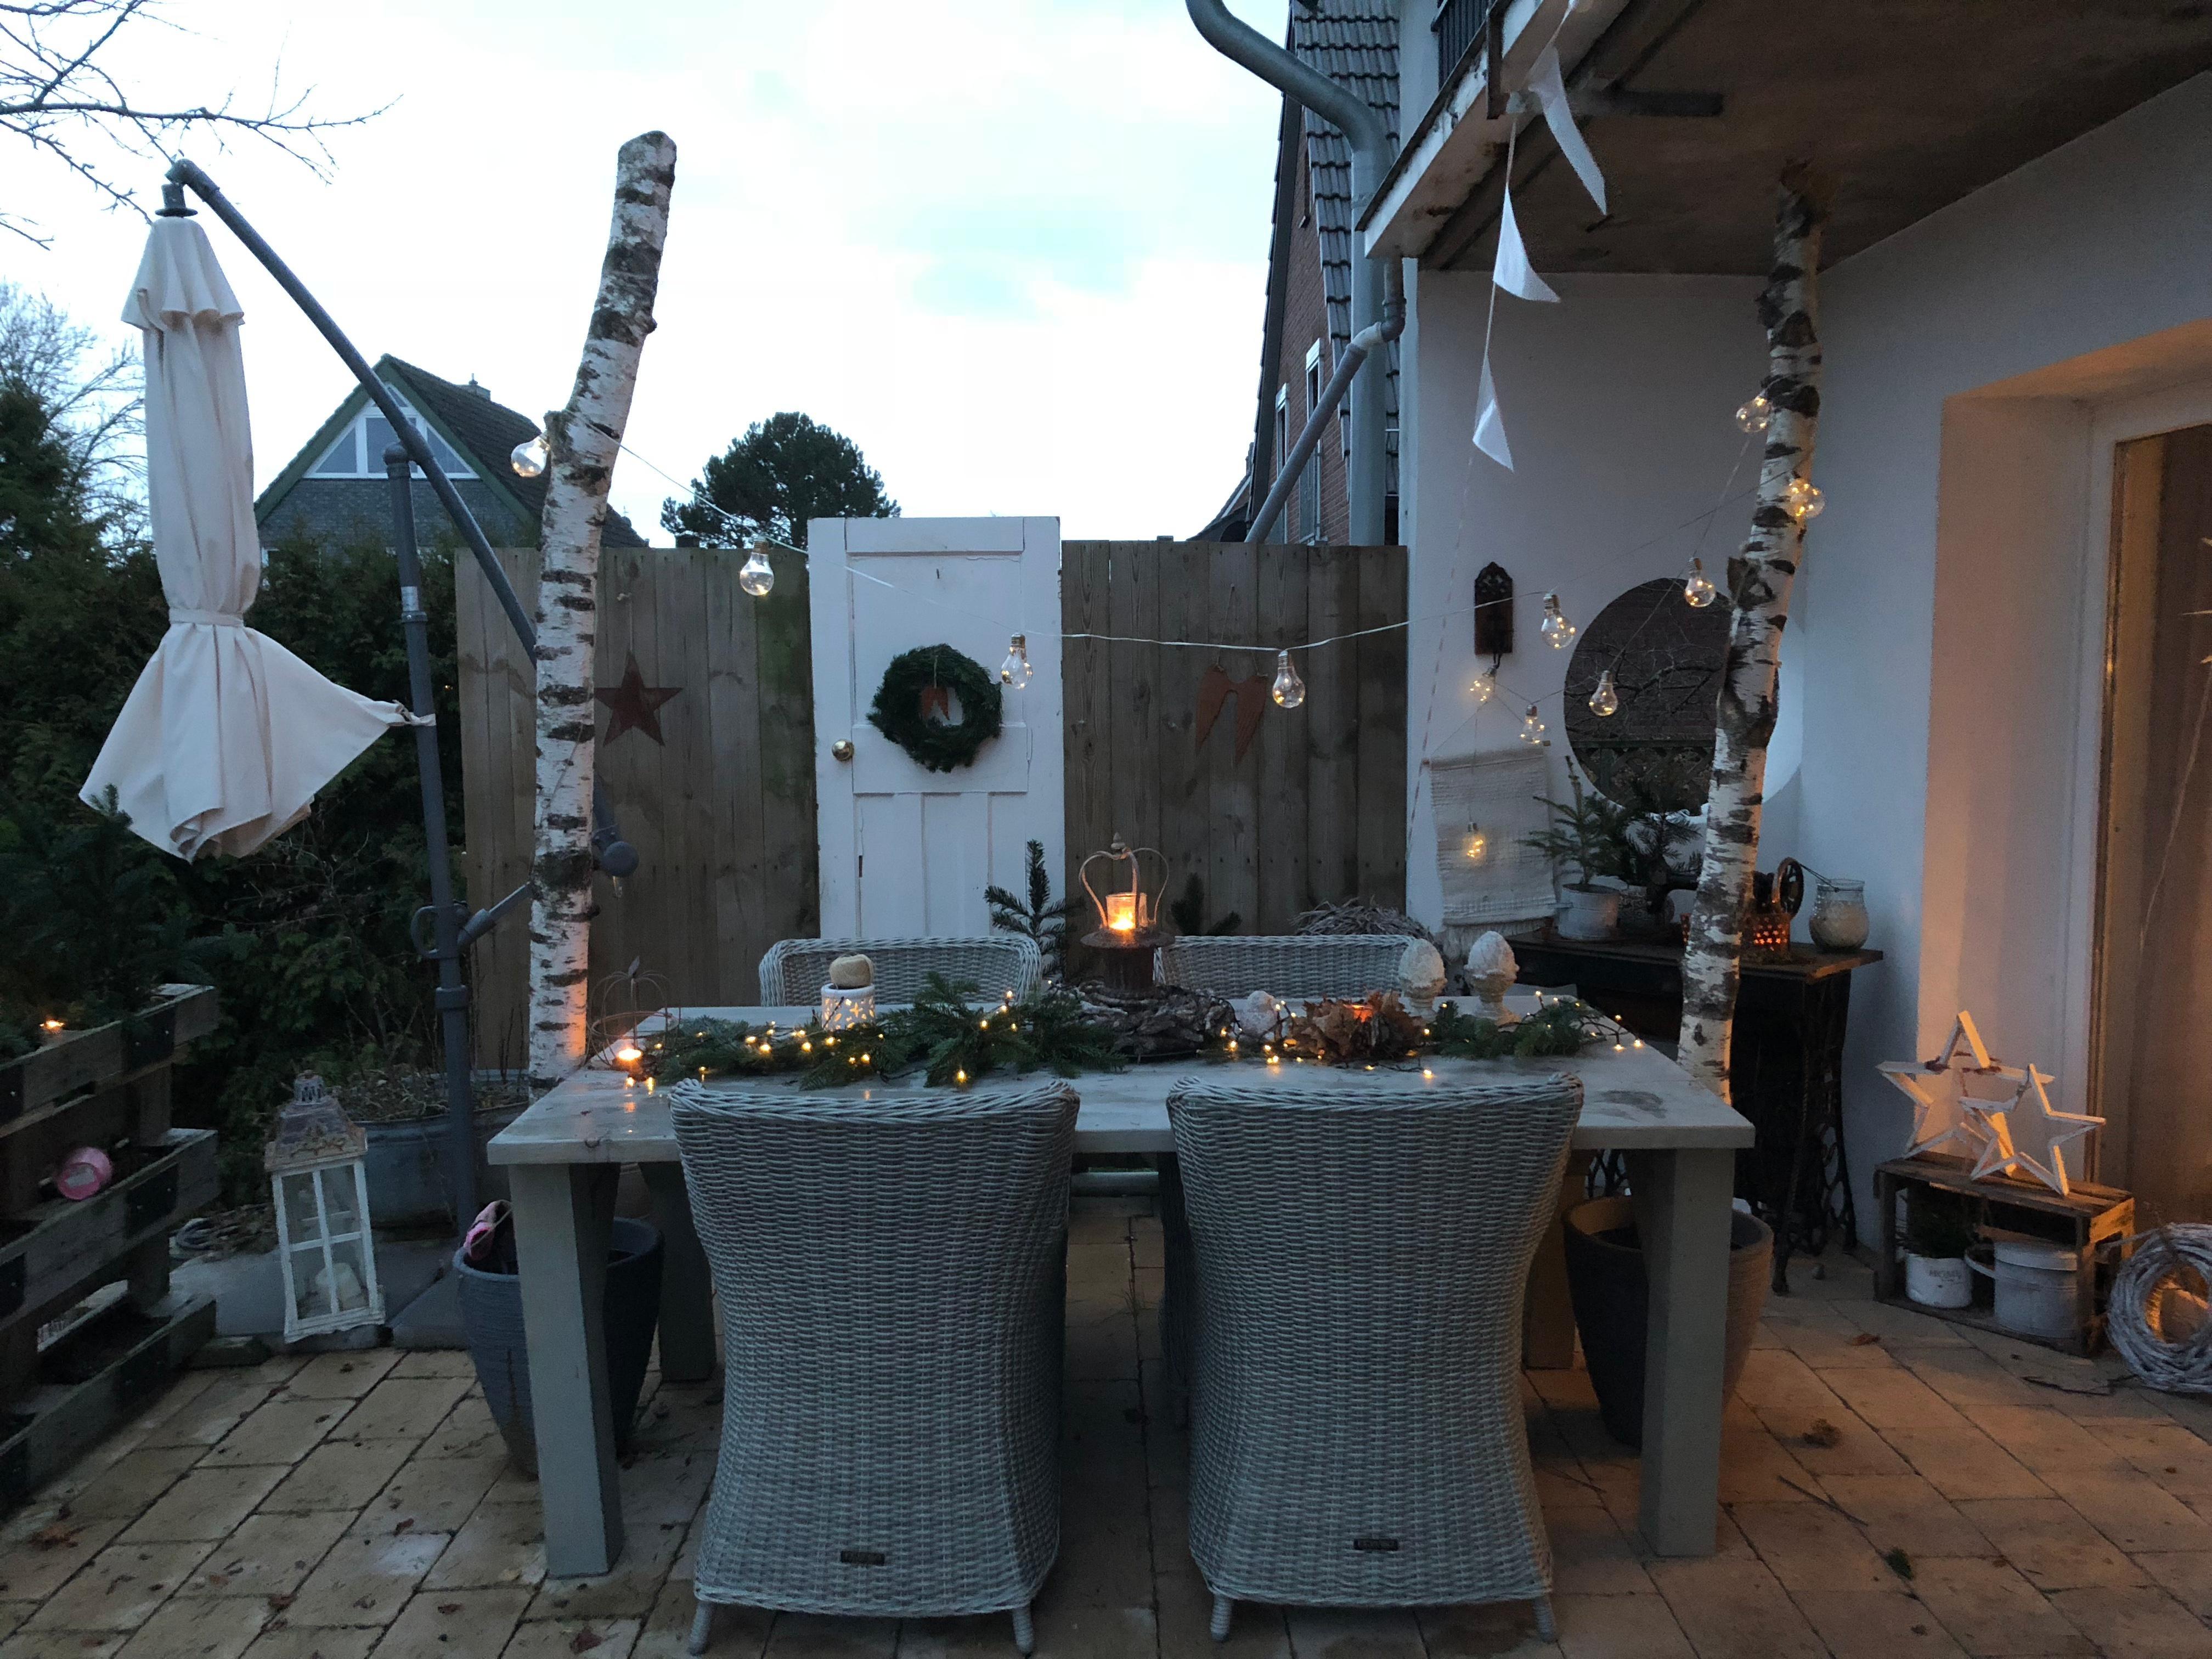 Terassendeko garten terrasse deko • COUCH